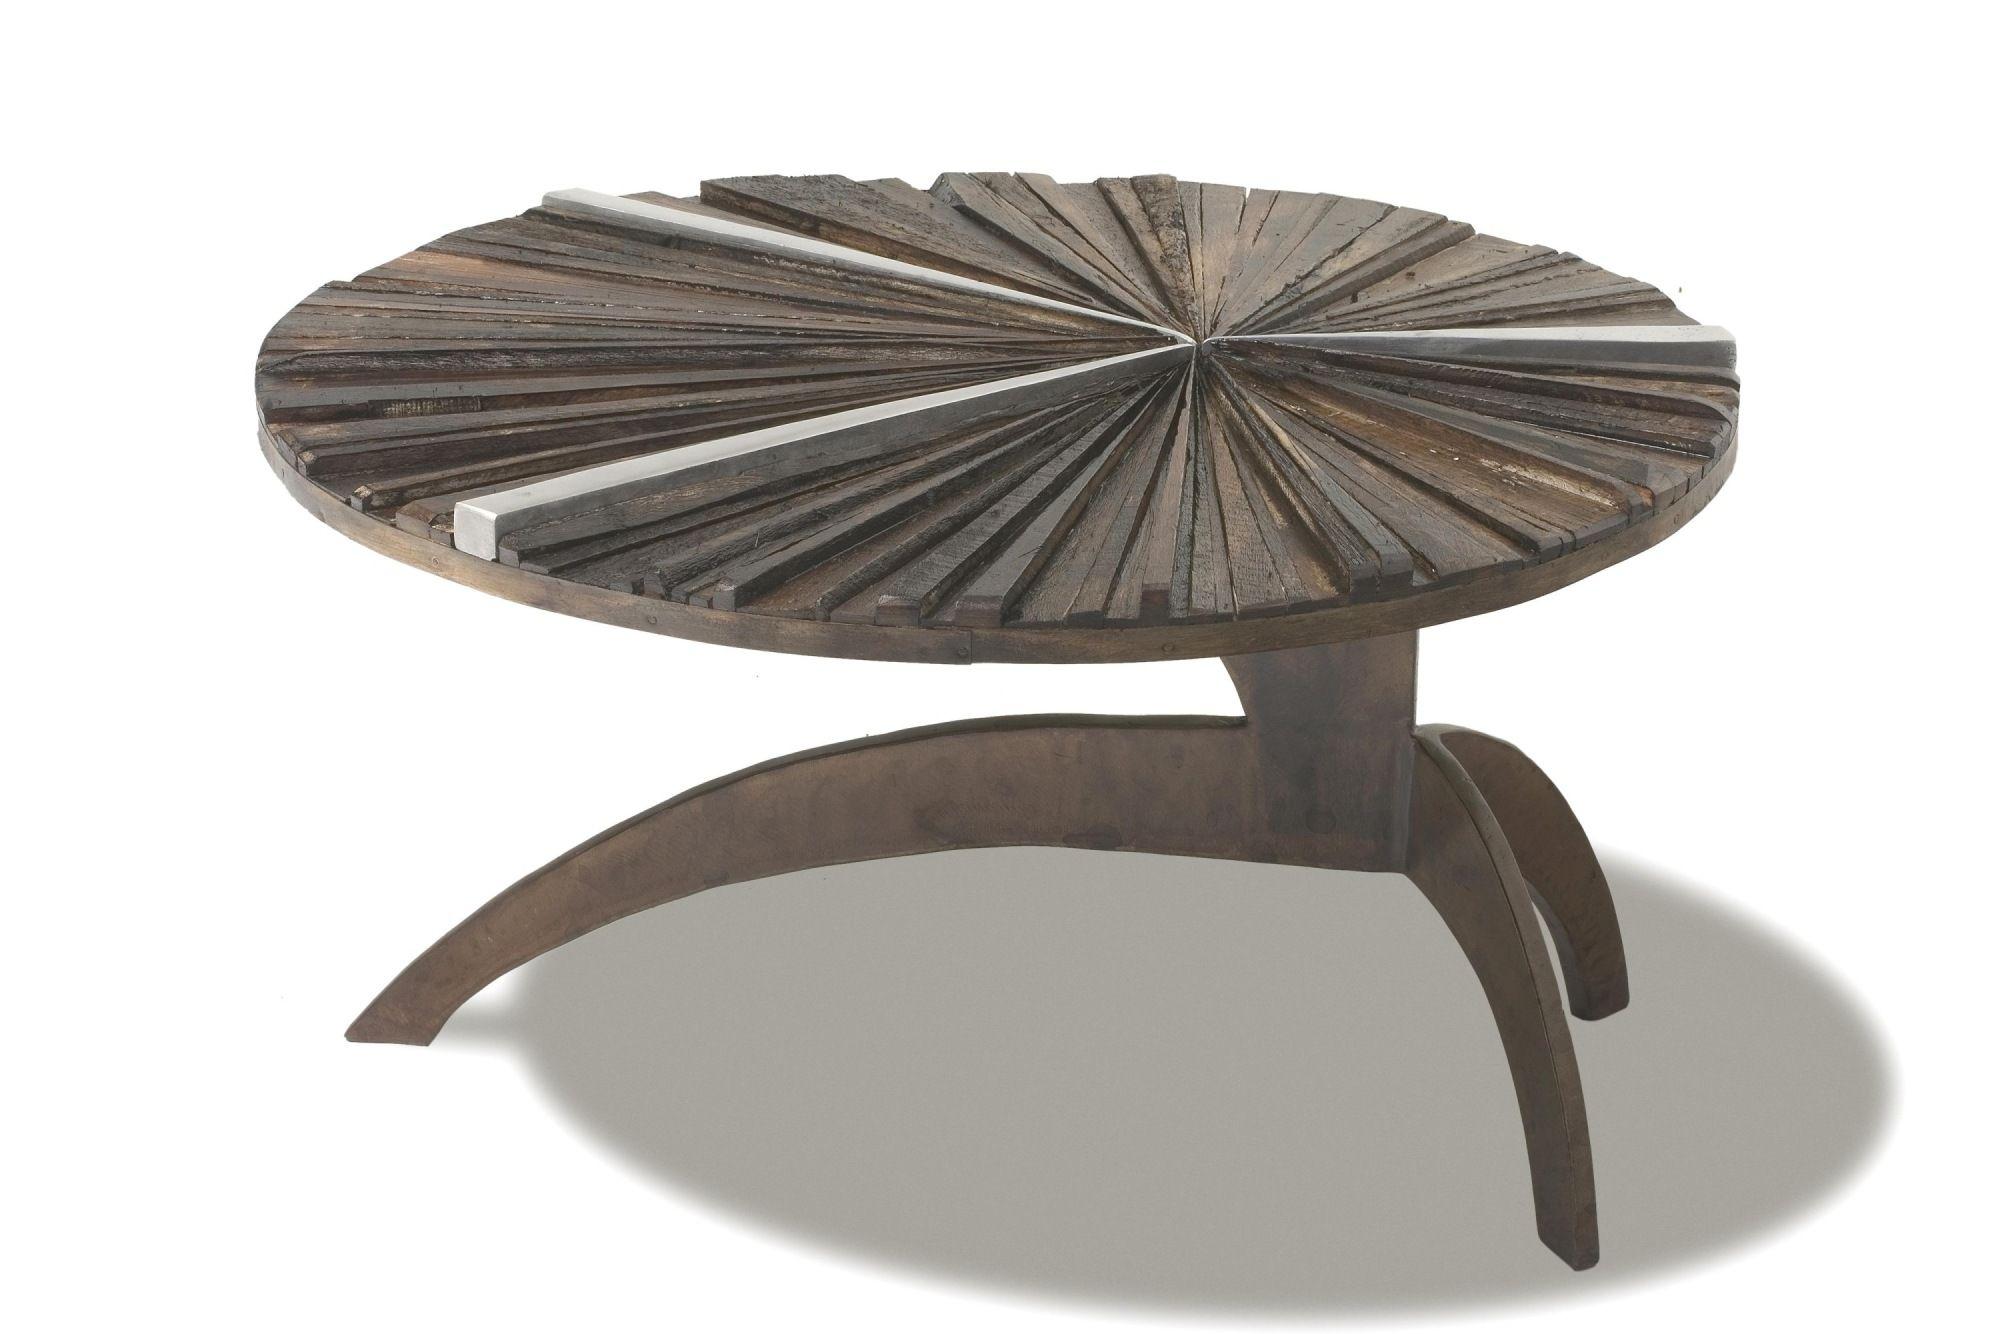 Ferpas Round Coffee Table 1 Ready Jpg 2000 1334 Coffee Table Furniture Unusual Coffee Tables Round Wood Coffee Table [ 1334 x 2000 Pixel ]